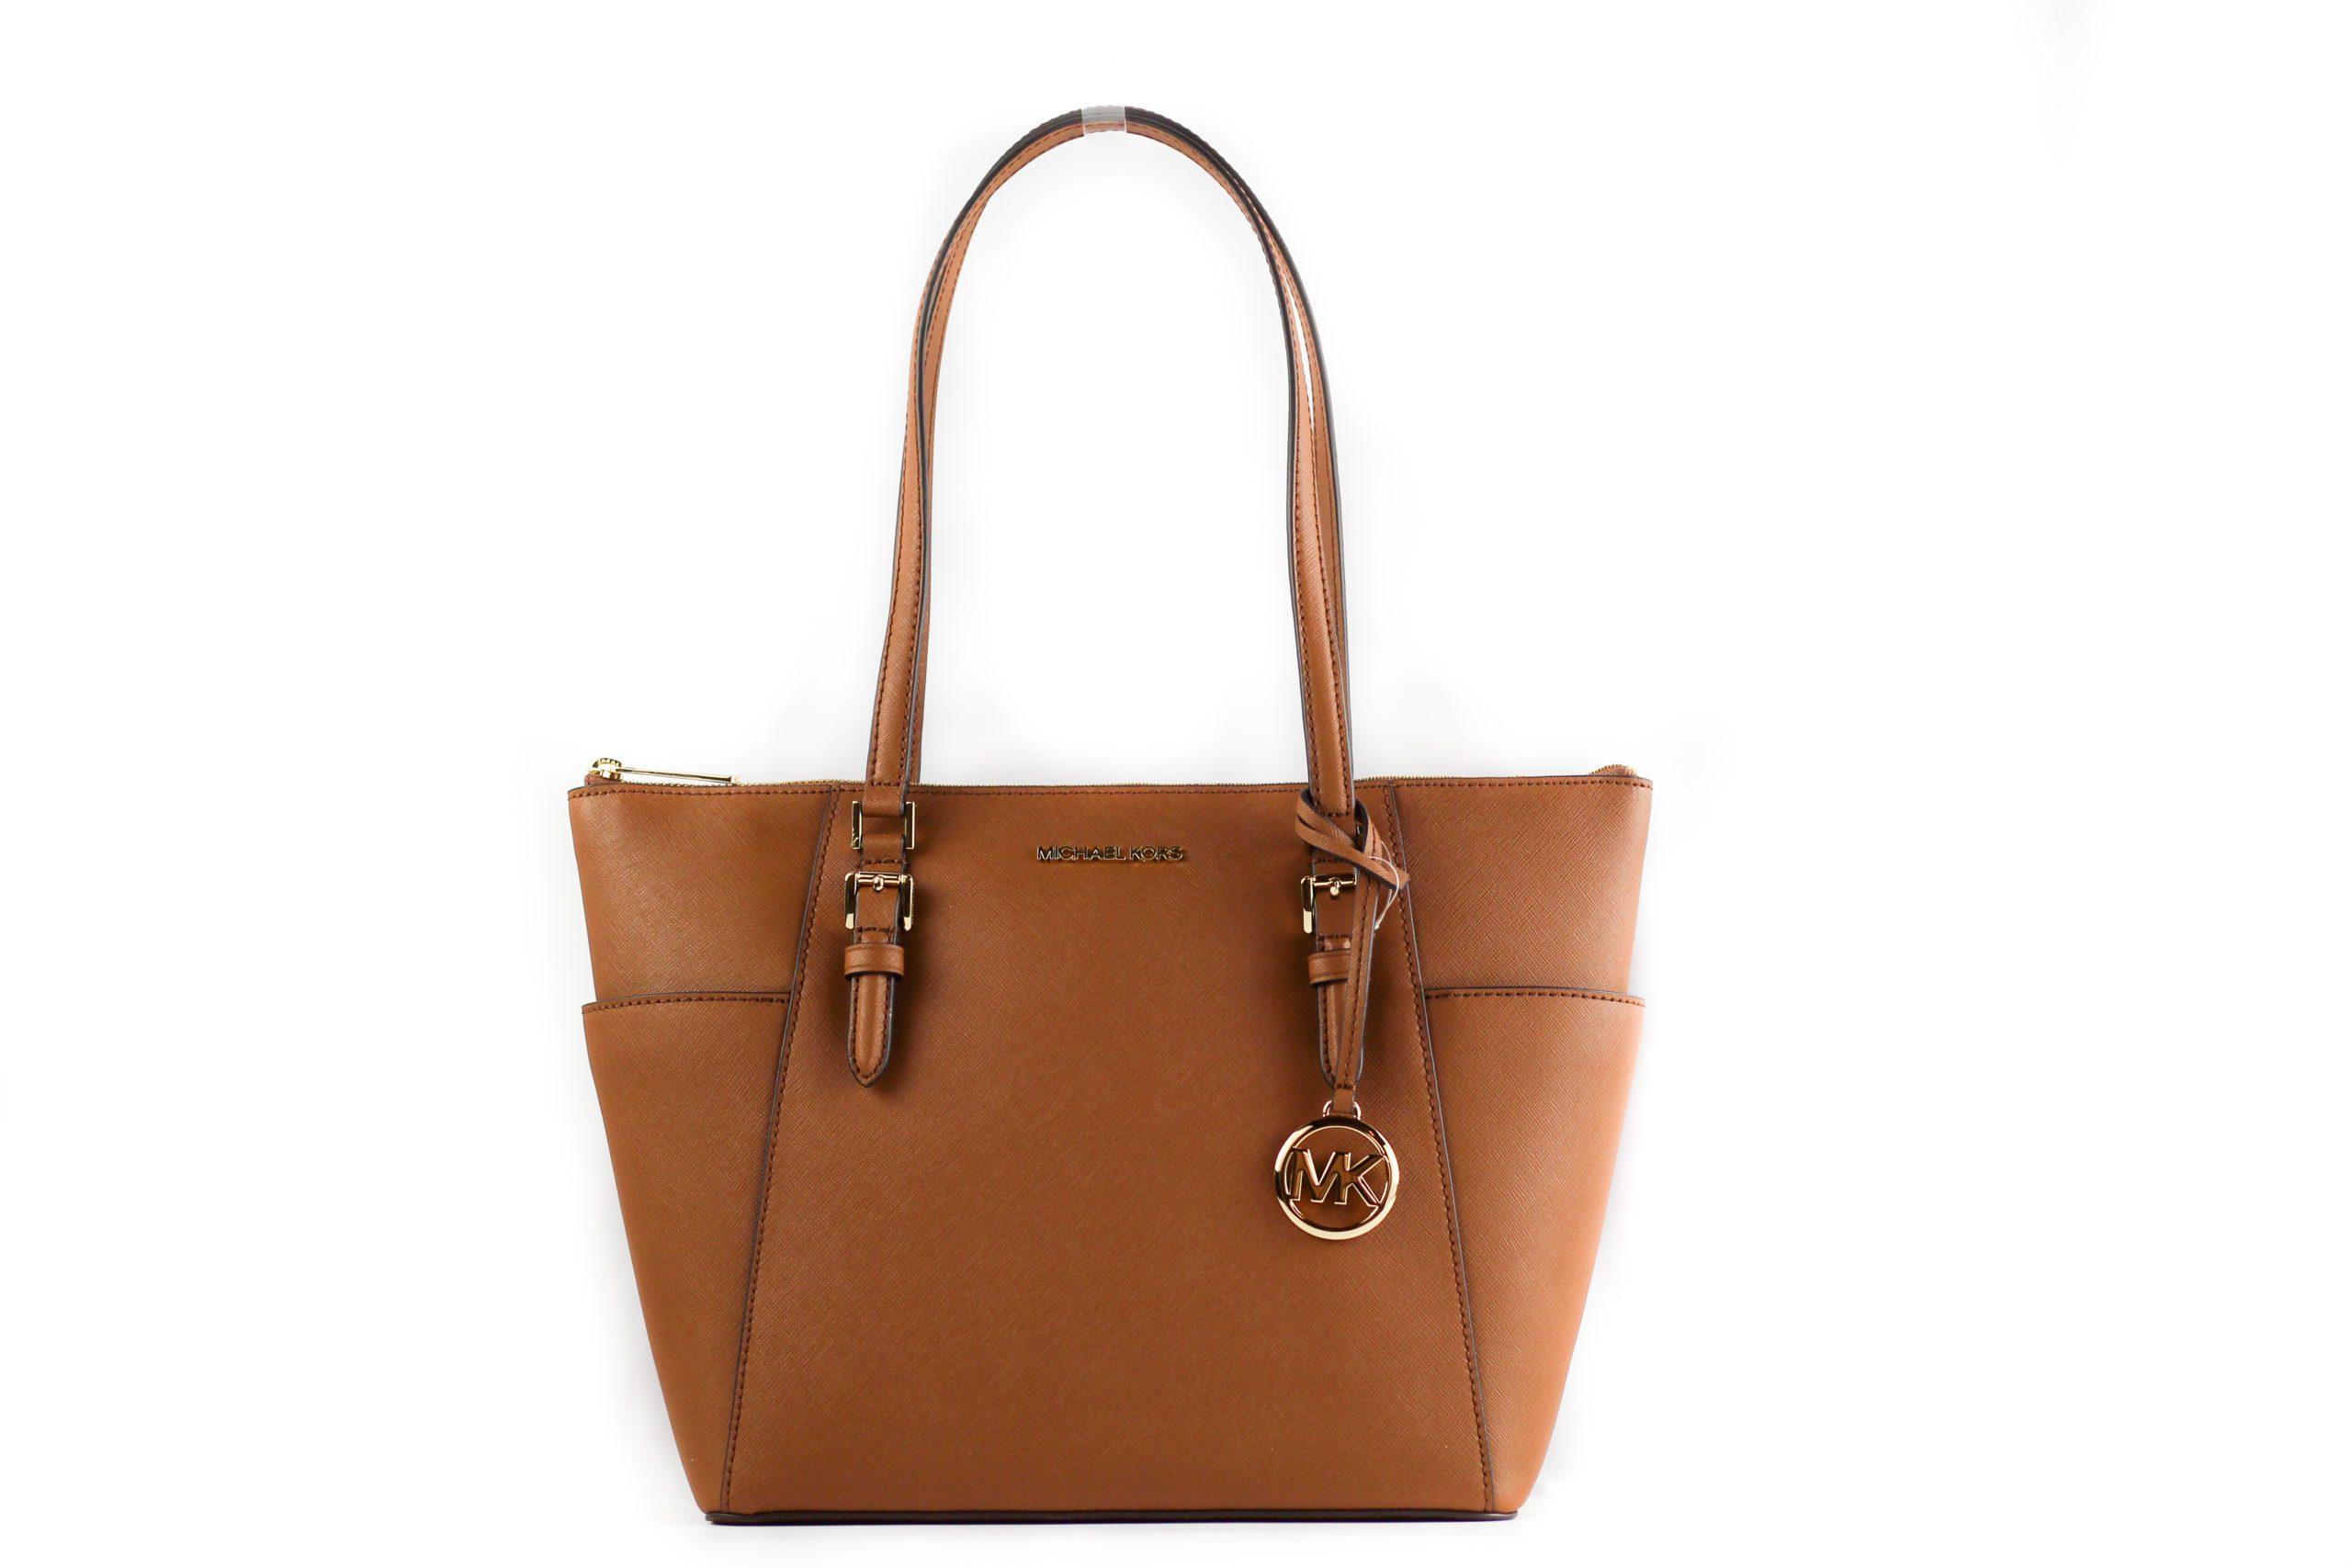 Charlotte Signature Leather Large Top Zip Tote Handbag Bag